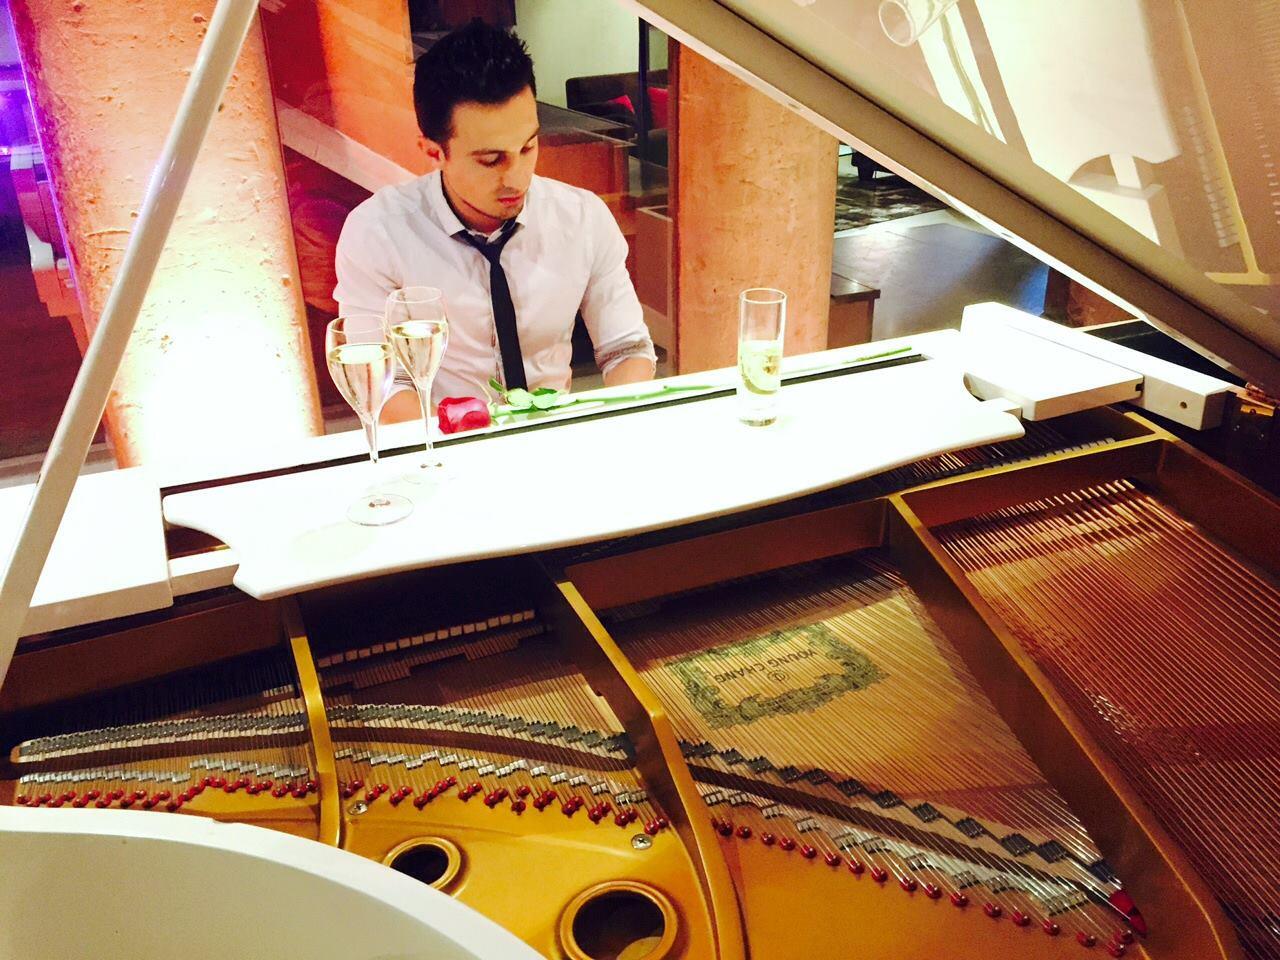 pianiste lyon archives pianiste dj professionnel. Black Bedroom Furniture Sets. Home Design Ideas